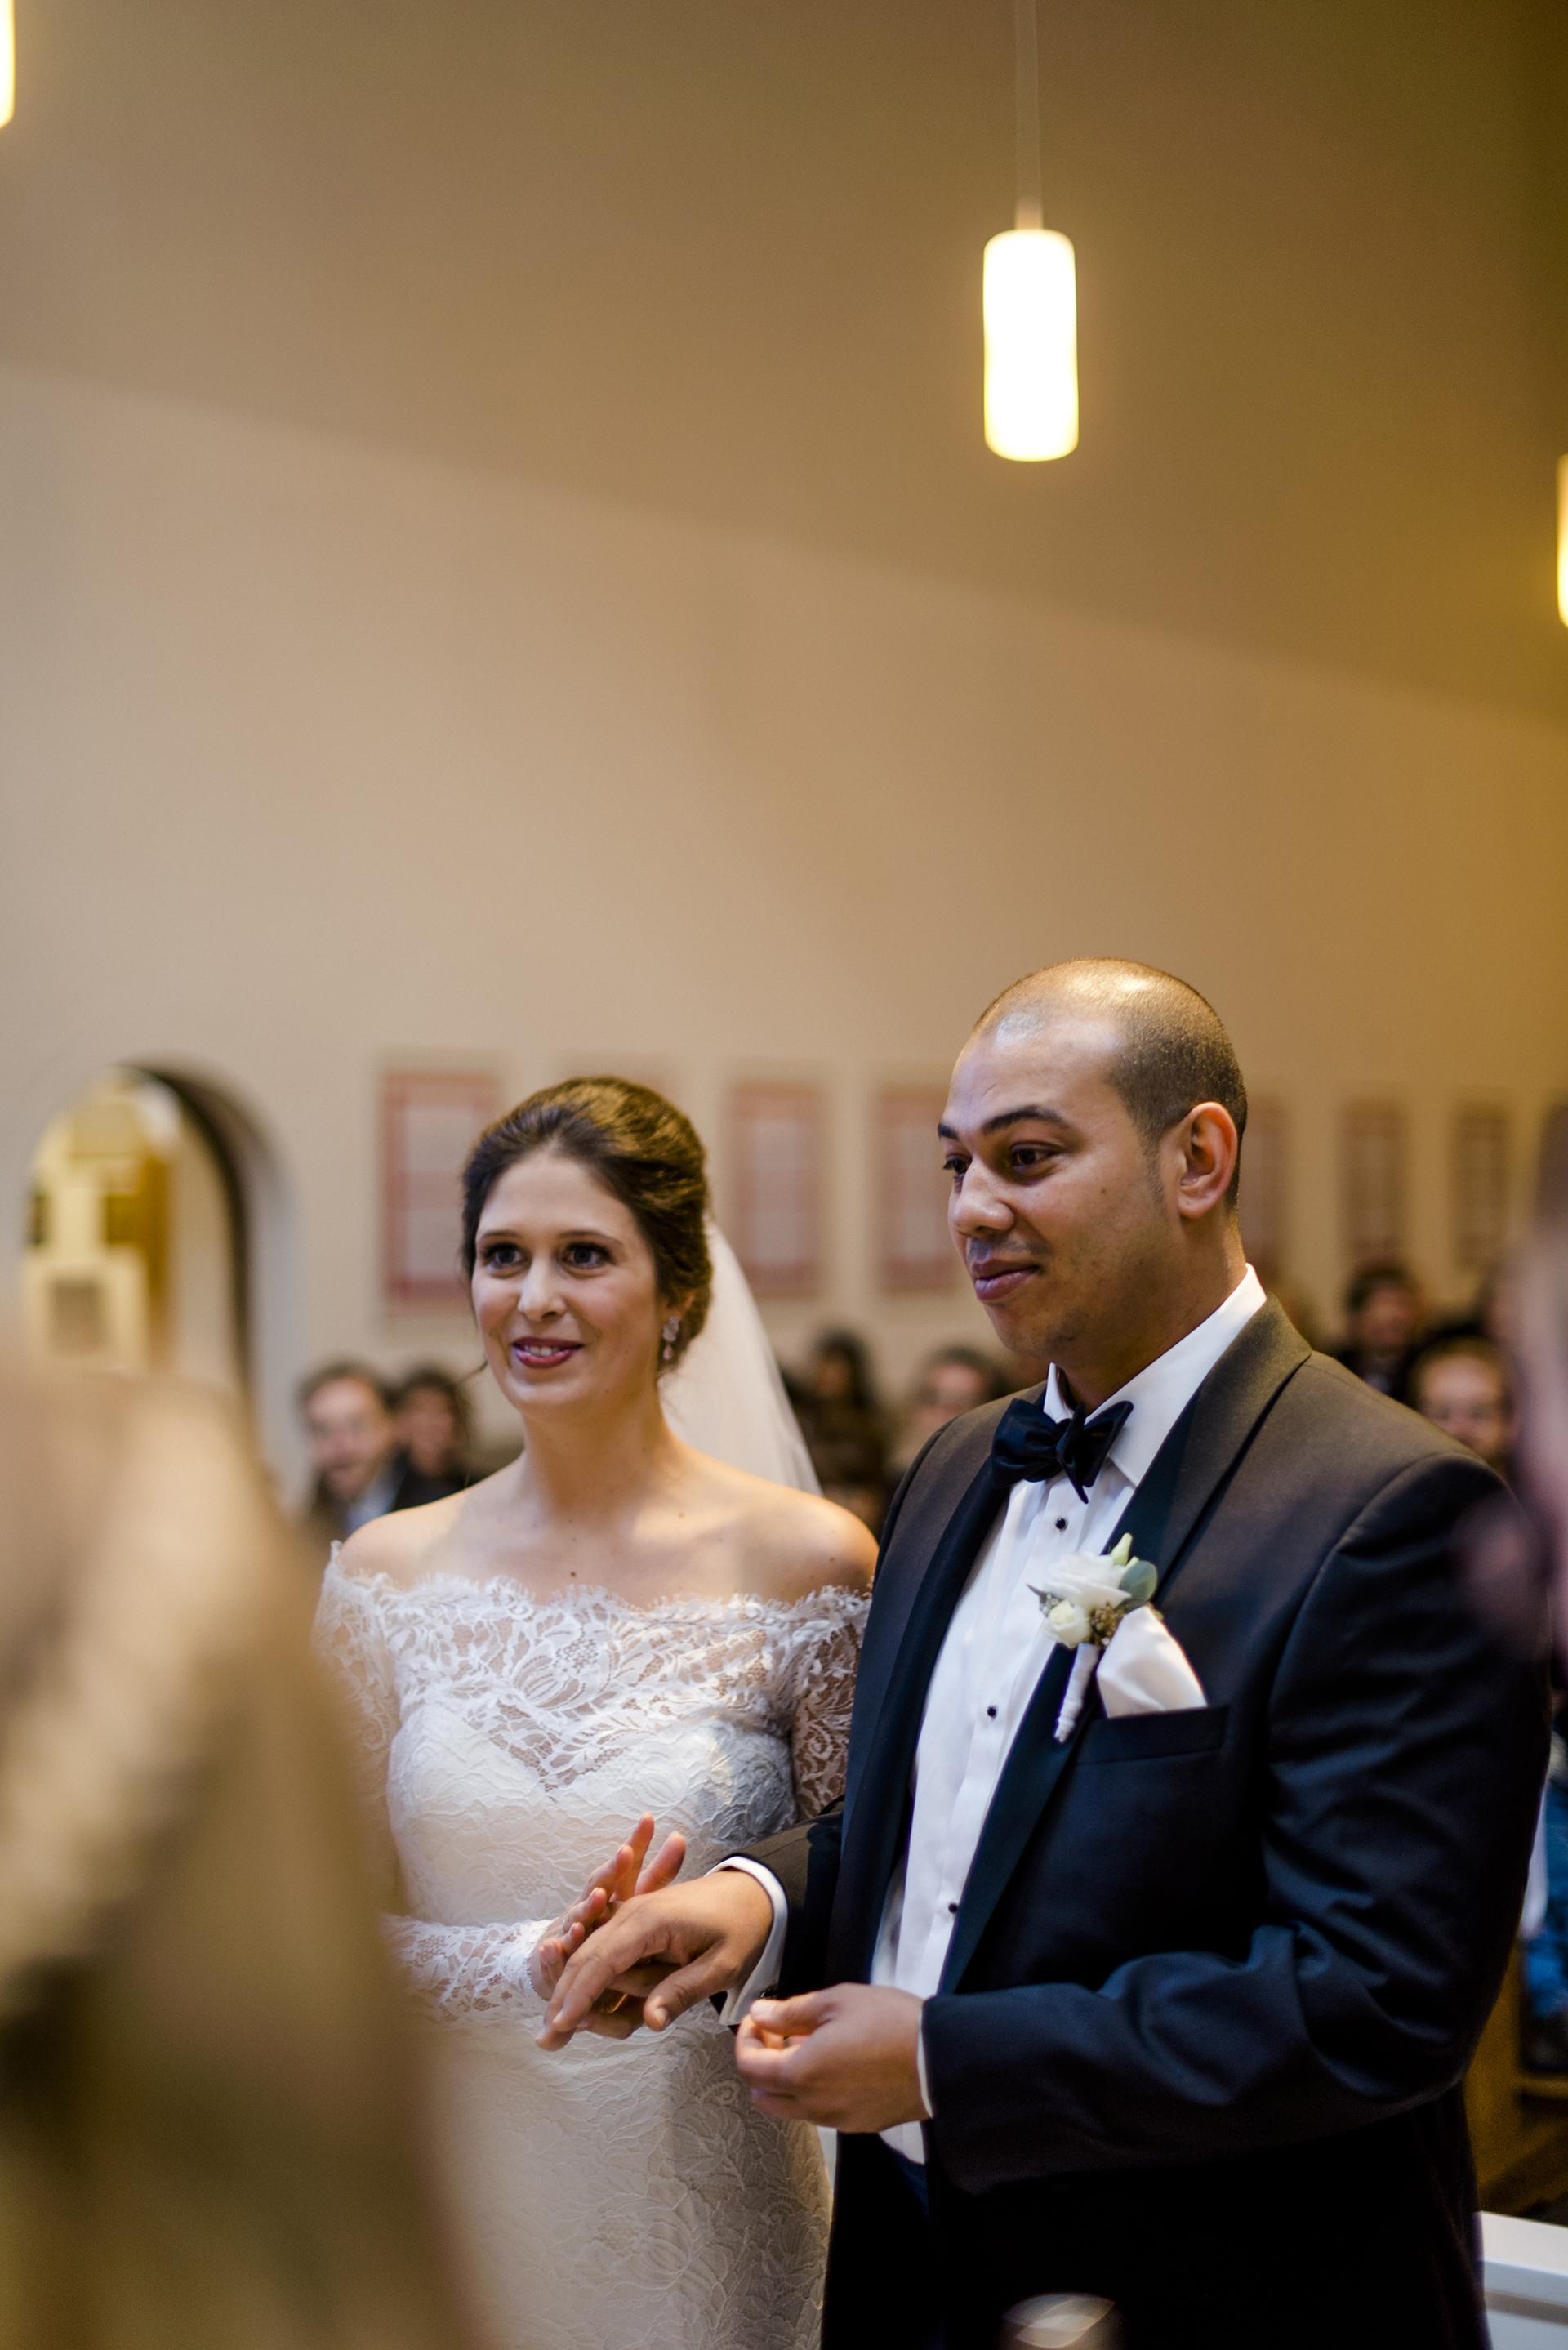 Hochzeitsreportage_J&D_025_Caroline Queda Fotografie